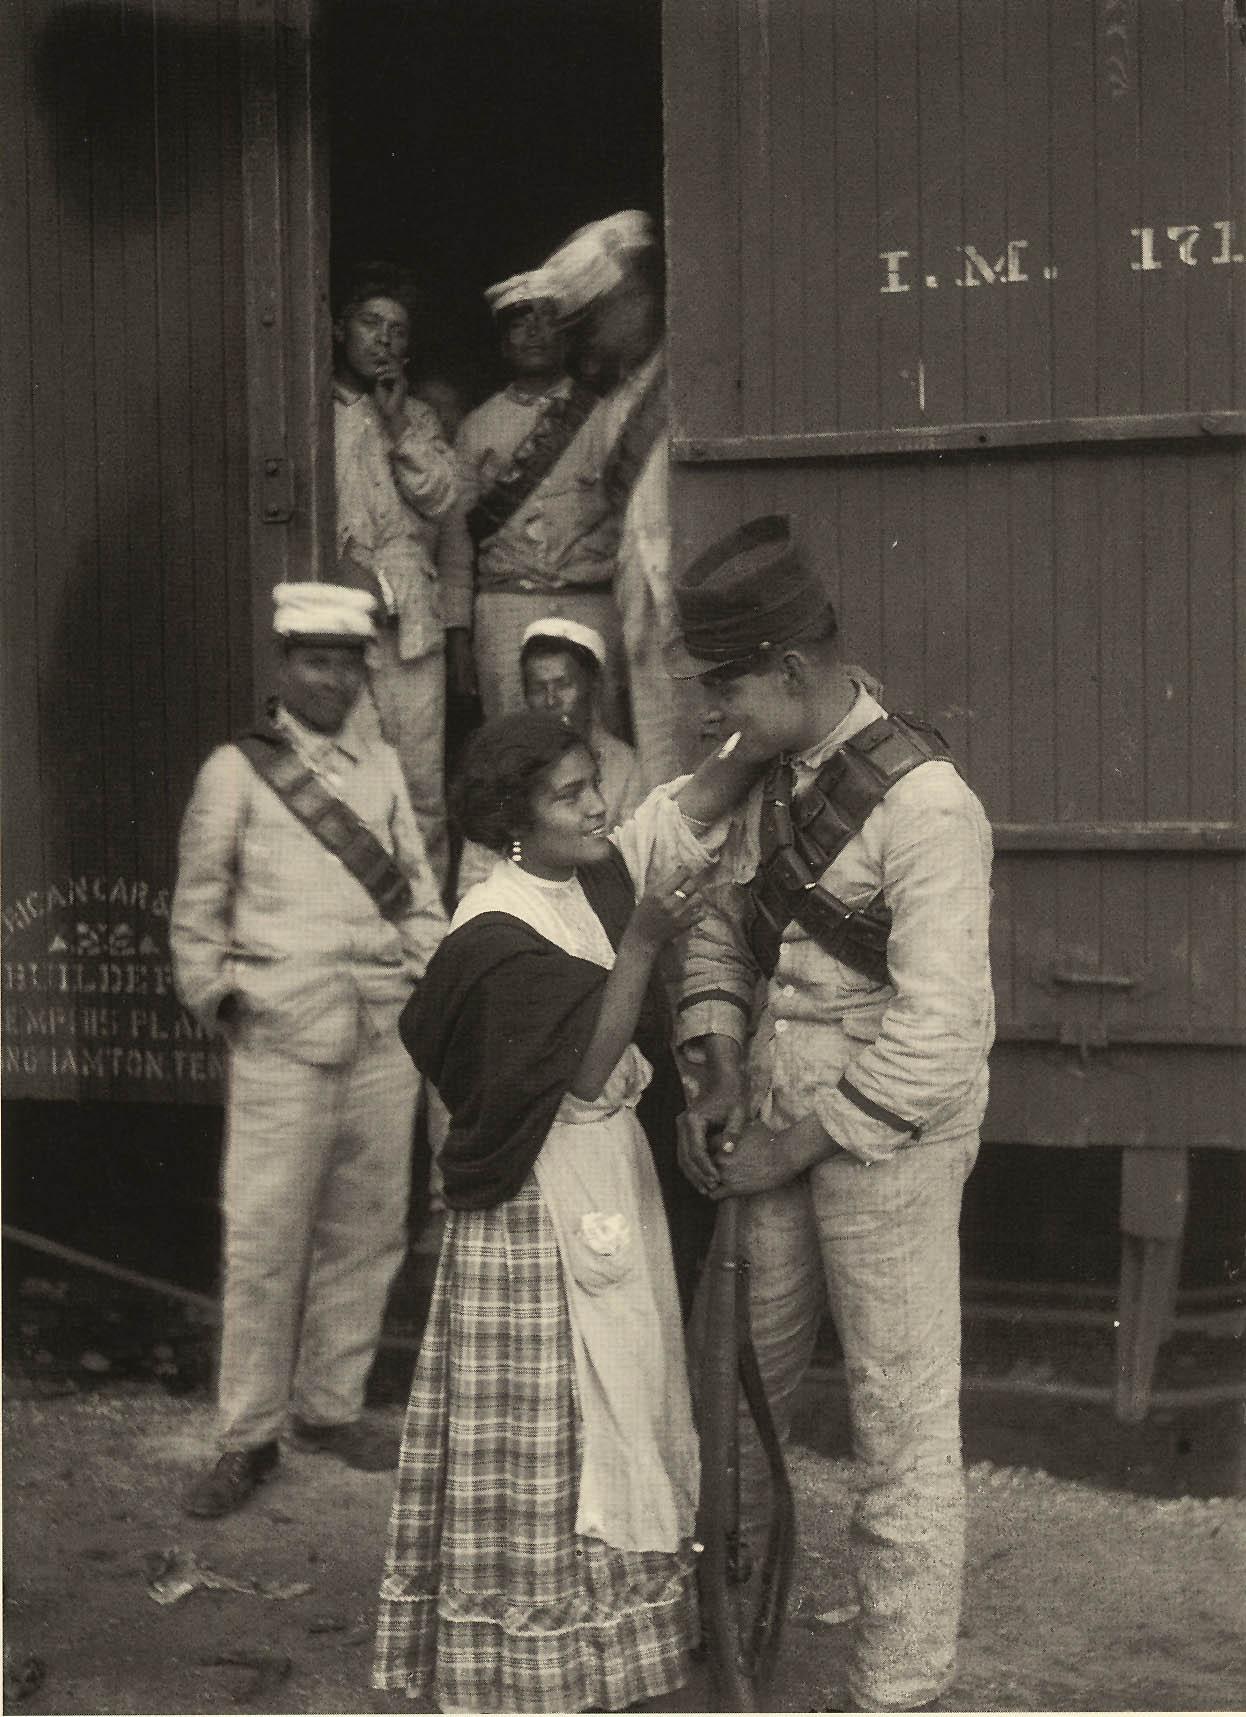 Fotos de la revolucion mexicana de 1910 74